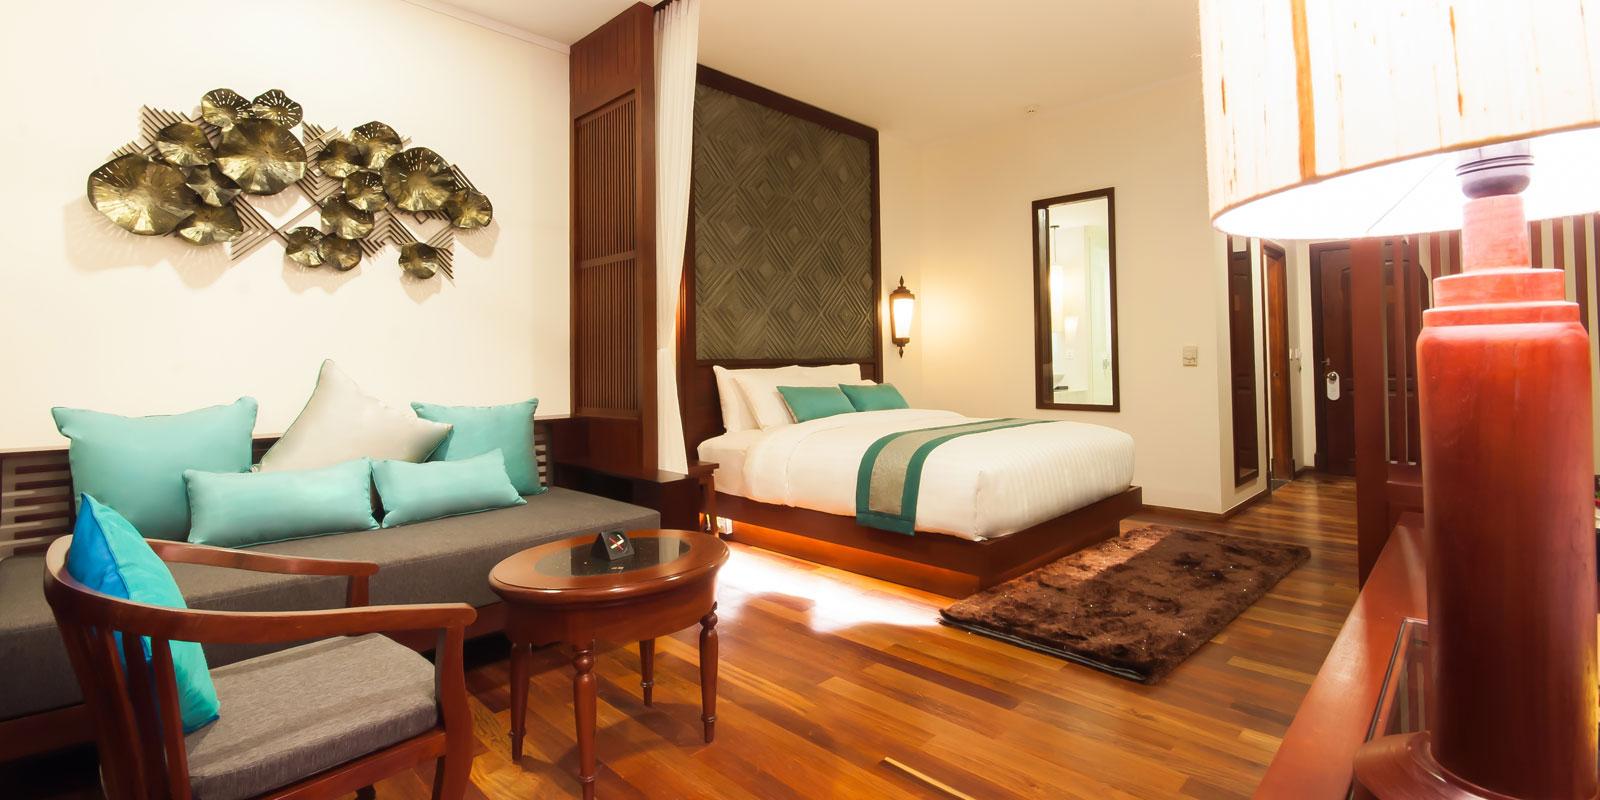 Landmark-Double-&-Couch-at-Lotus-Blanc-Resort